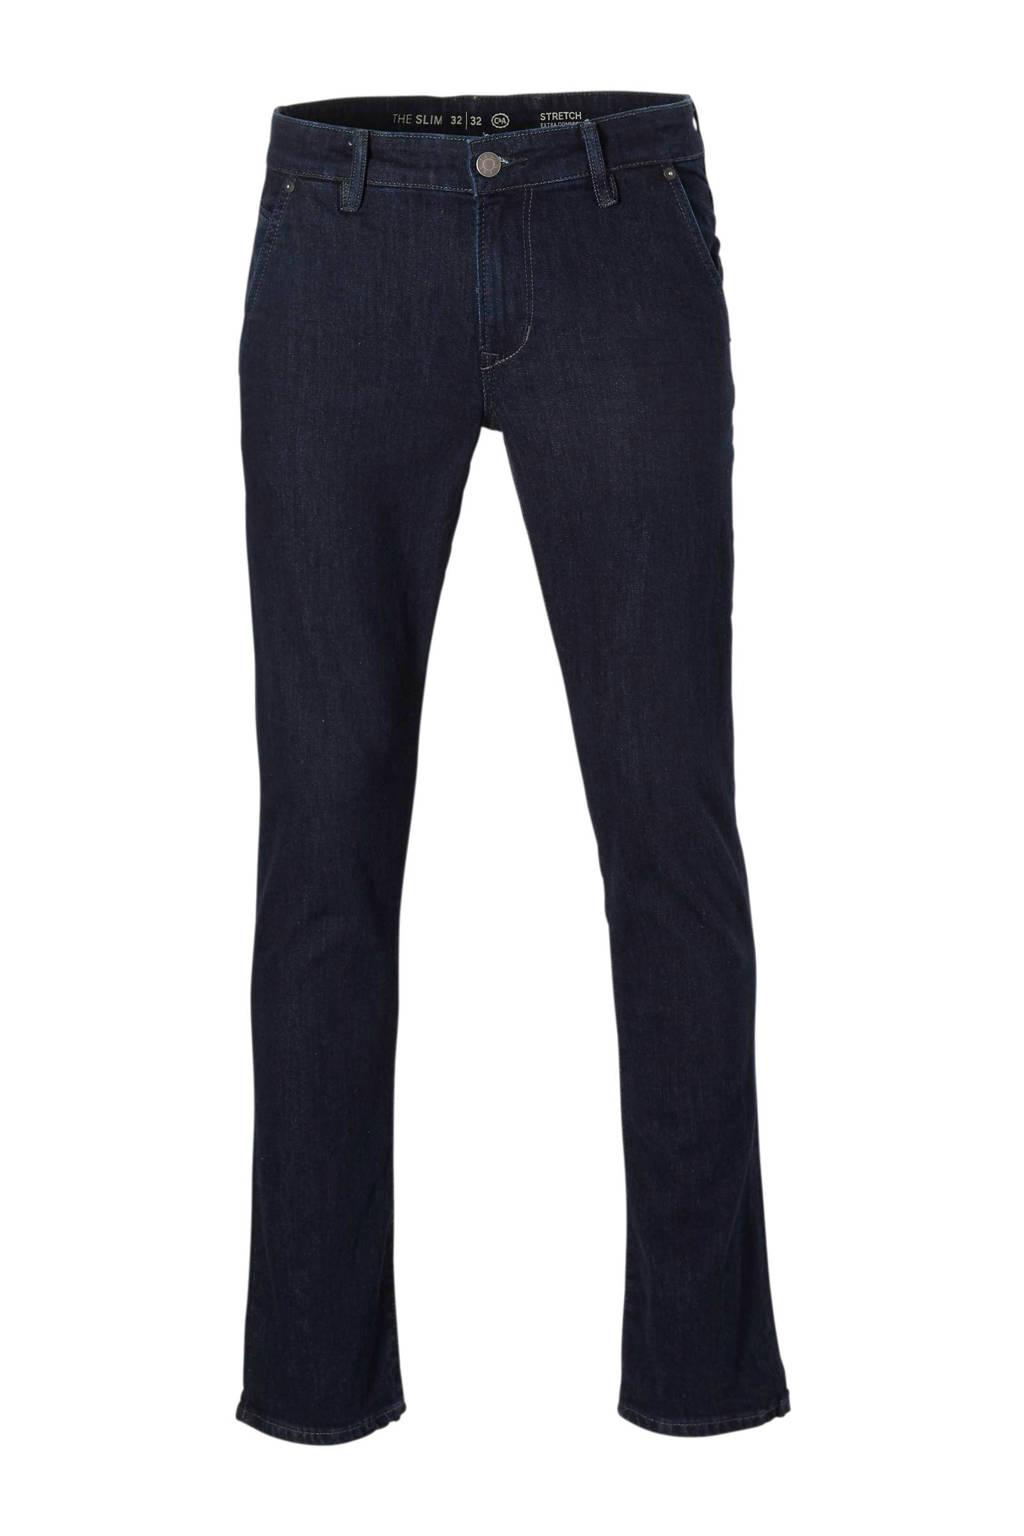 C&A The Denim  slim slim fit jeans, Dark denim